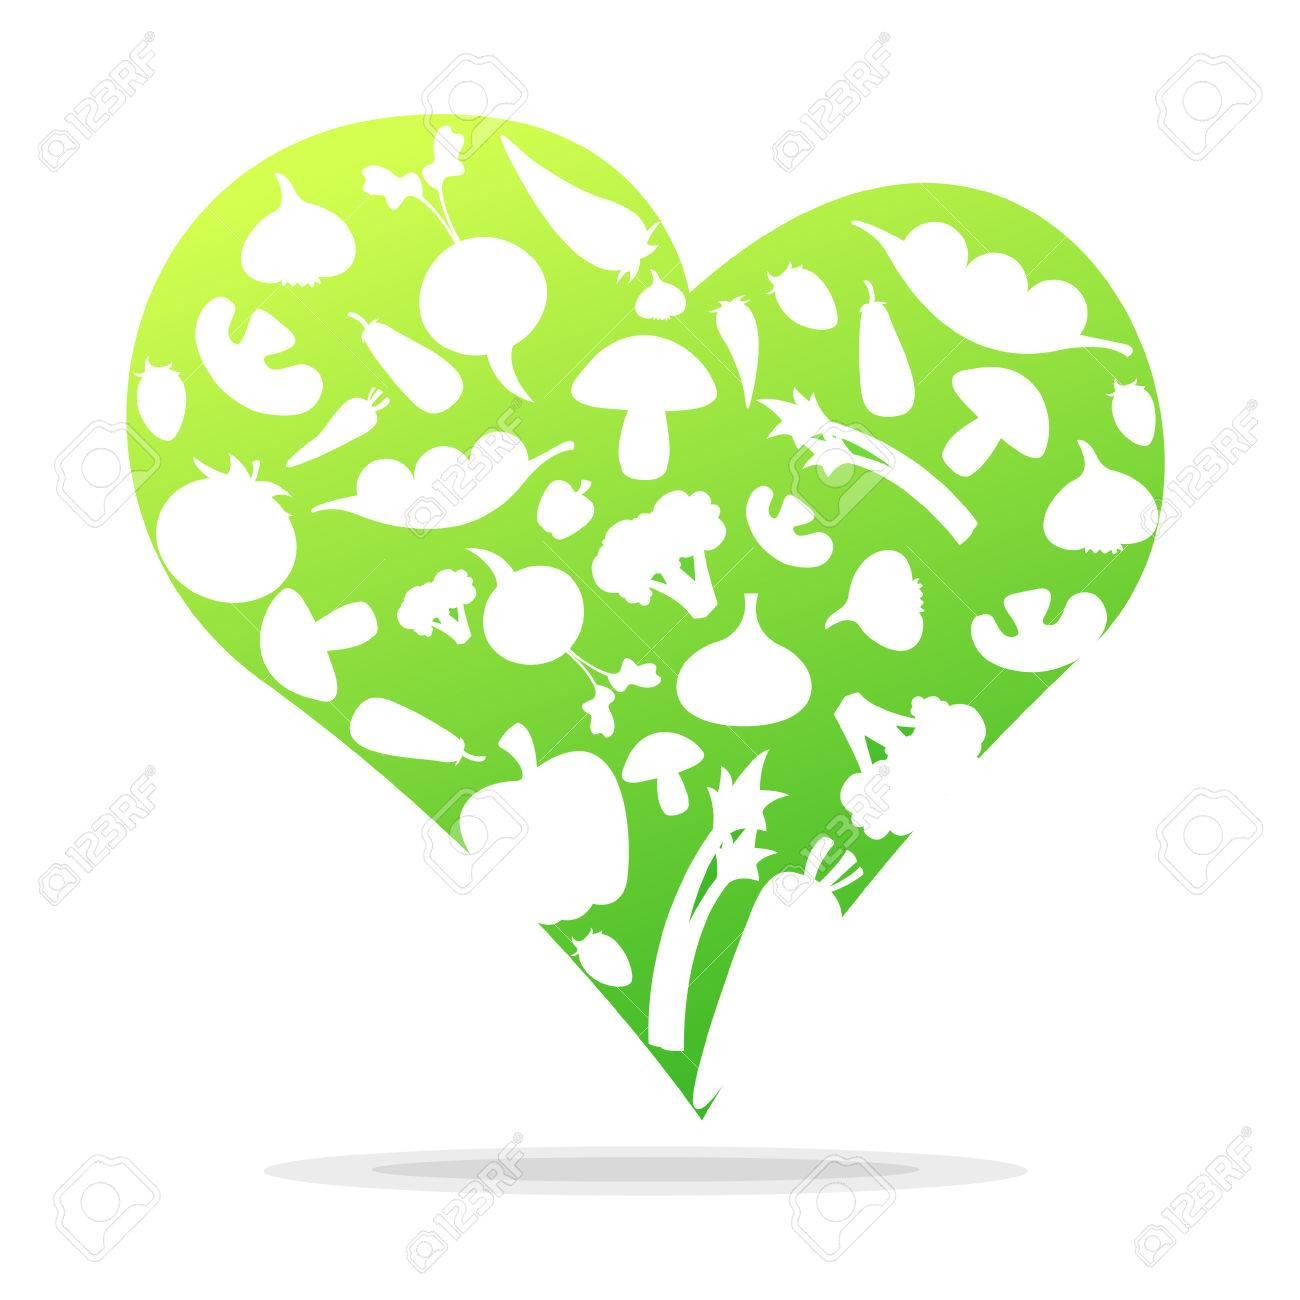 Vegetables in heart shapes. Love to eat vegetables. - 25470565